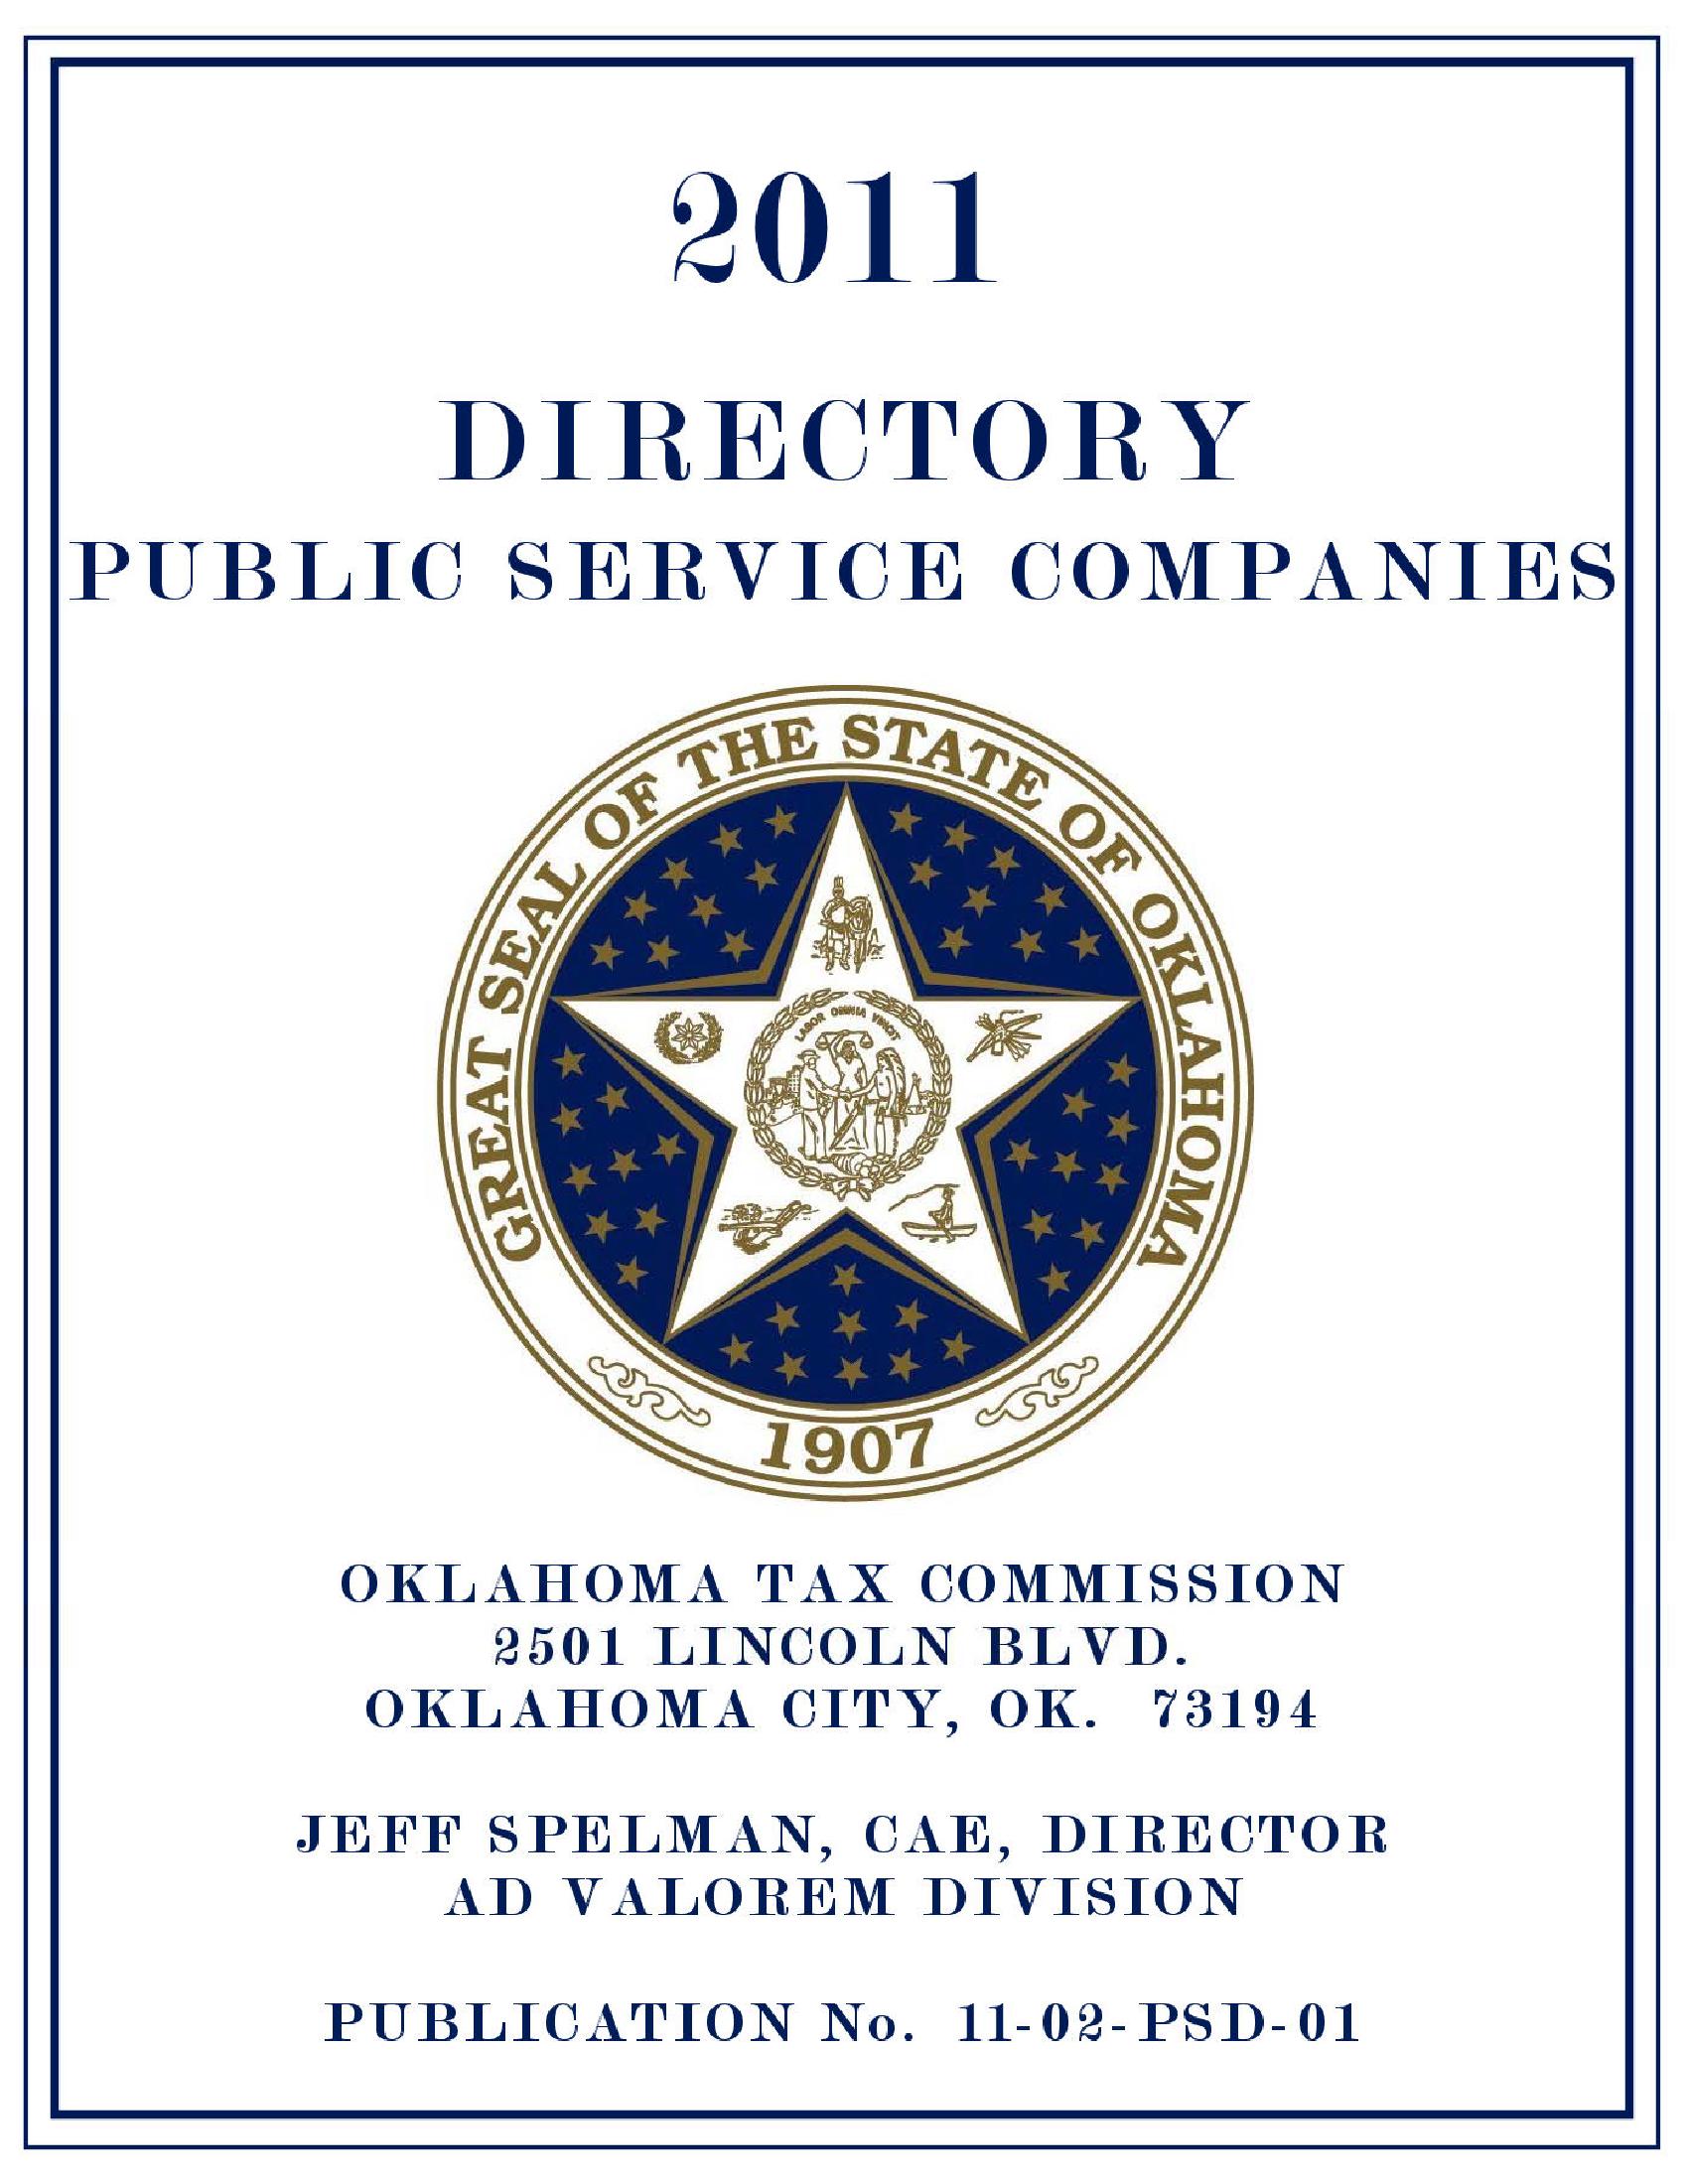 Public Service Directory 2011 - Documents OK Gov - Oklahoma Digital